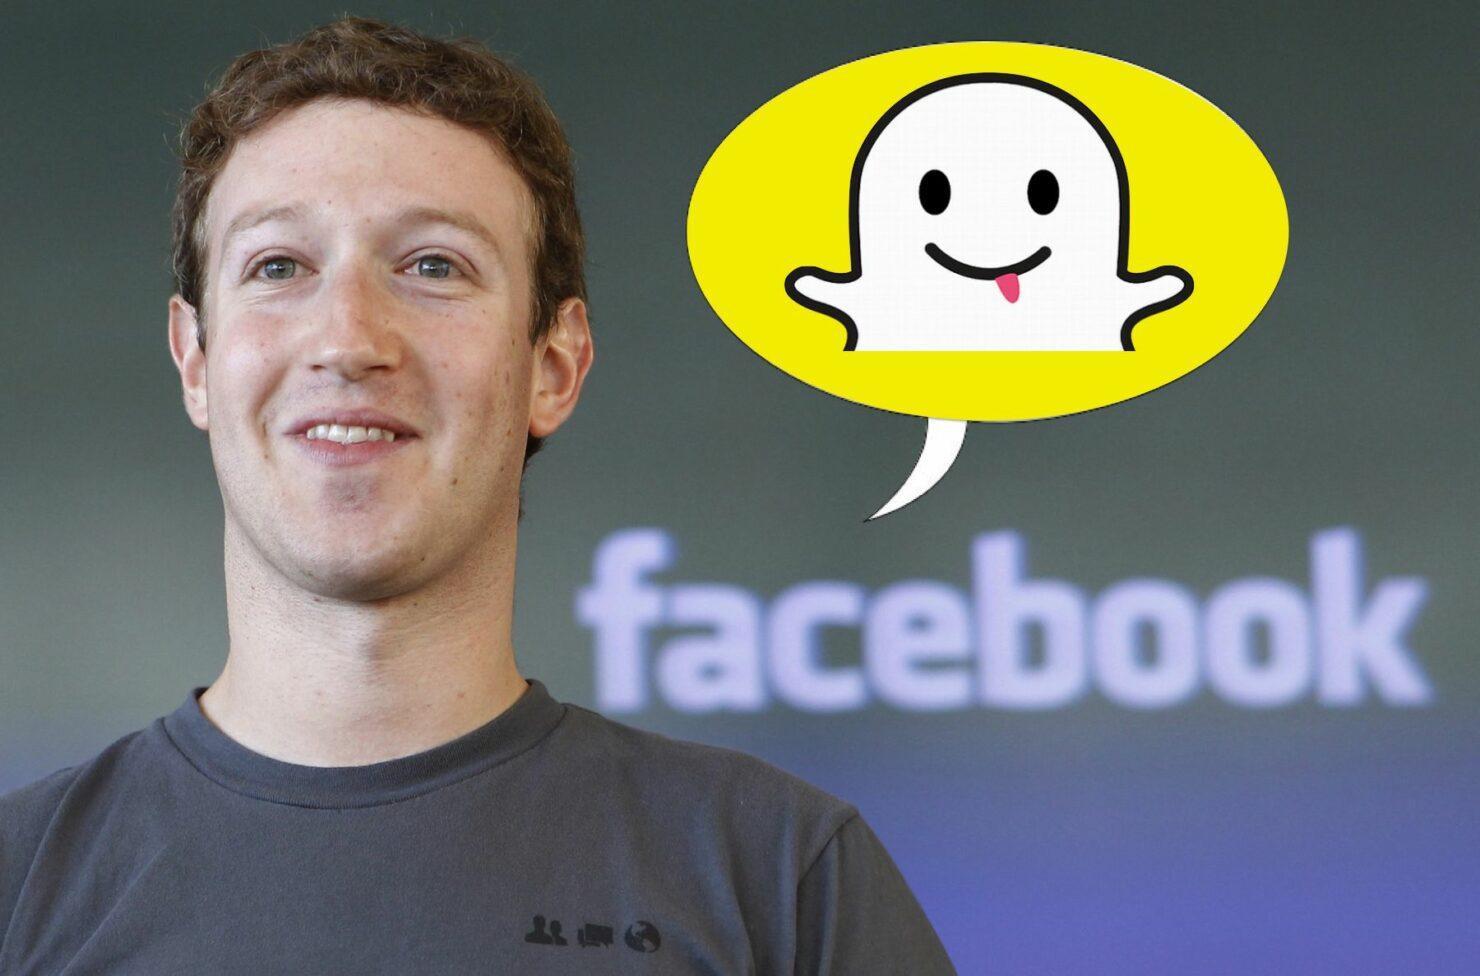 Facebook and snapchat